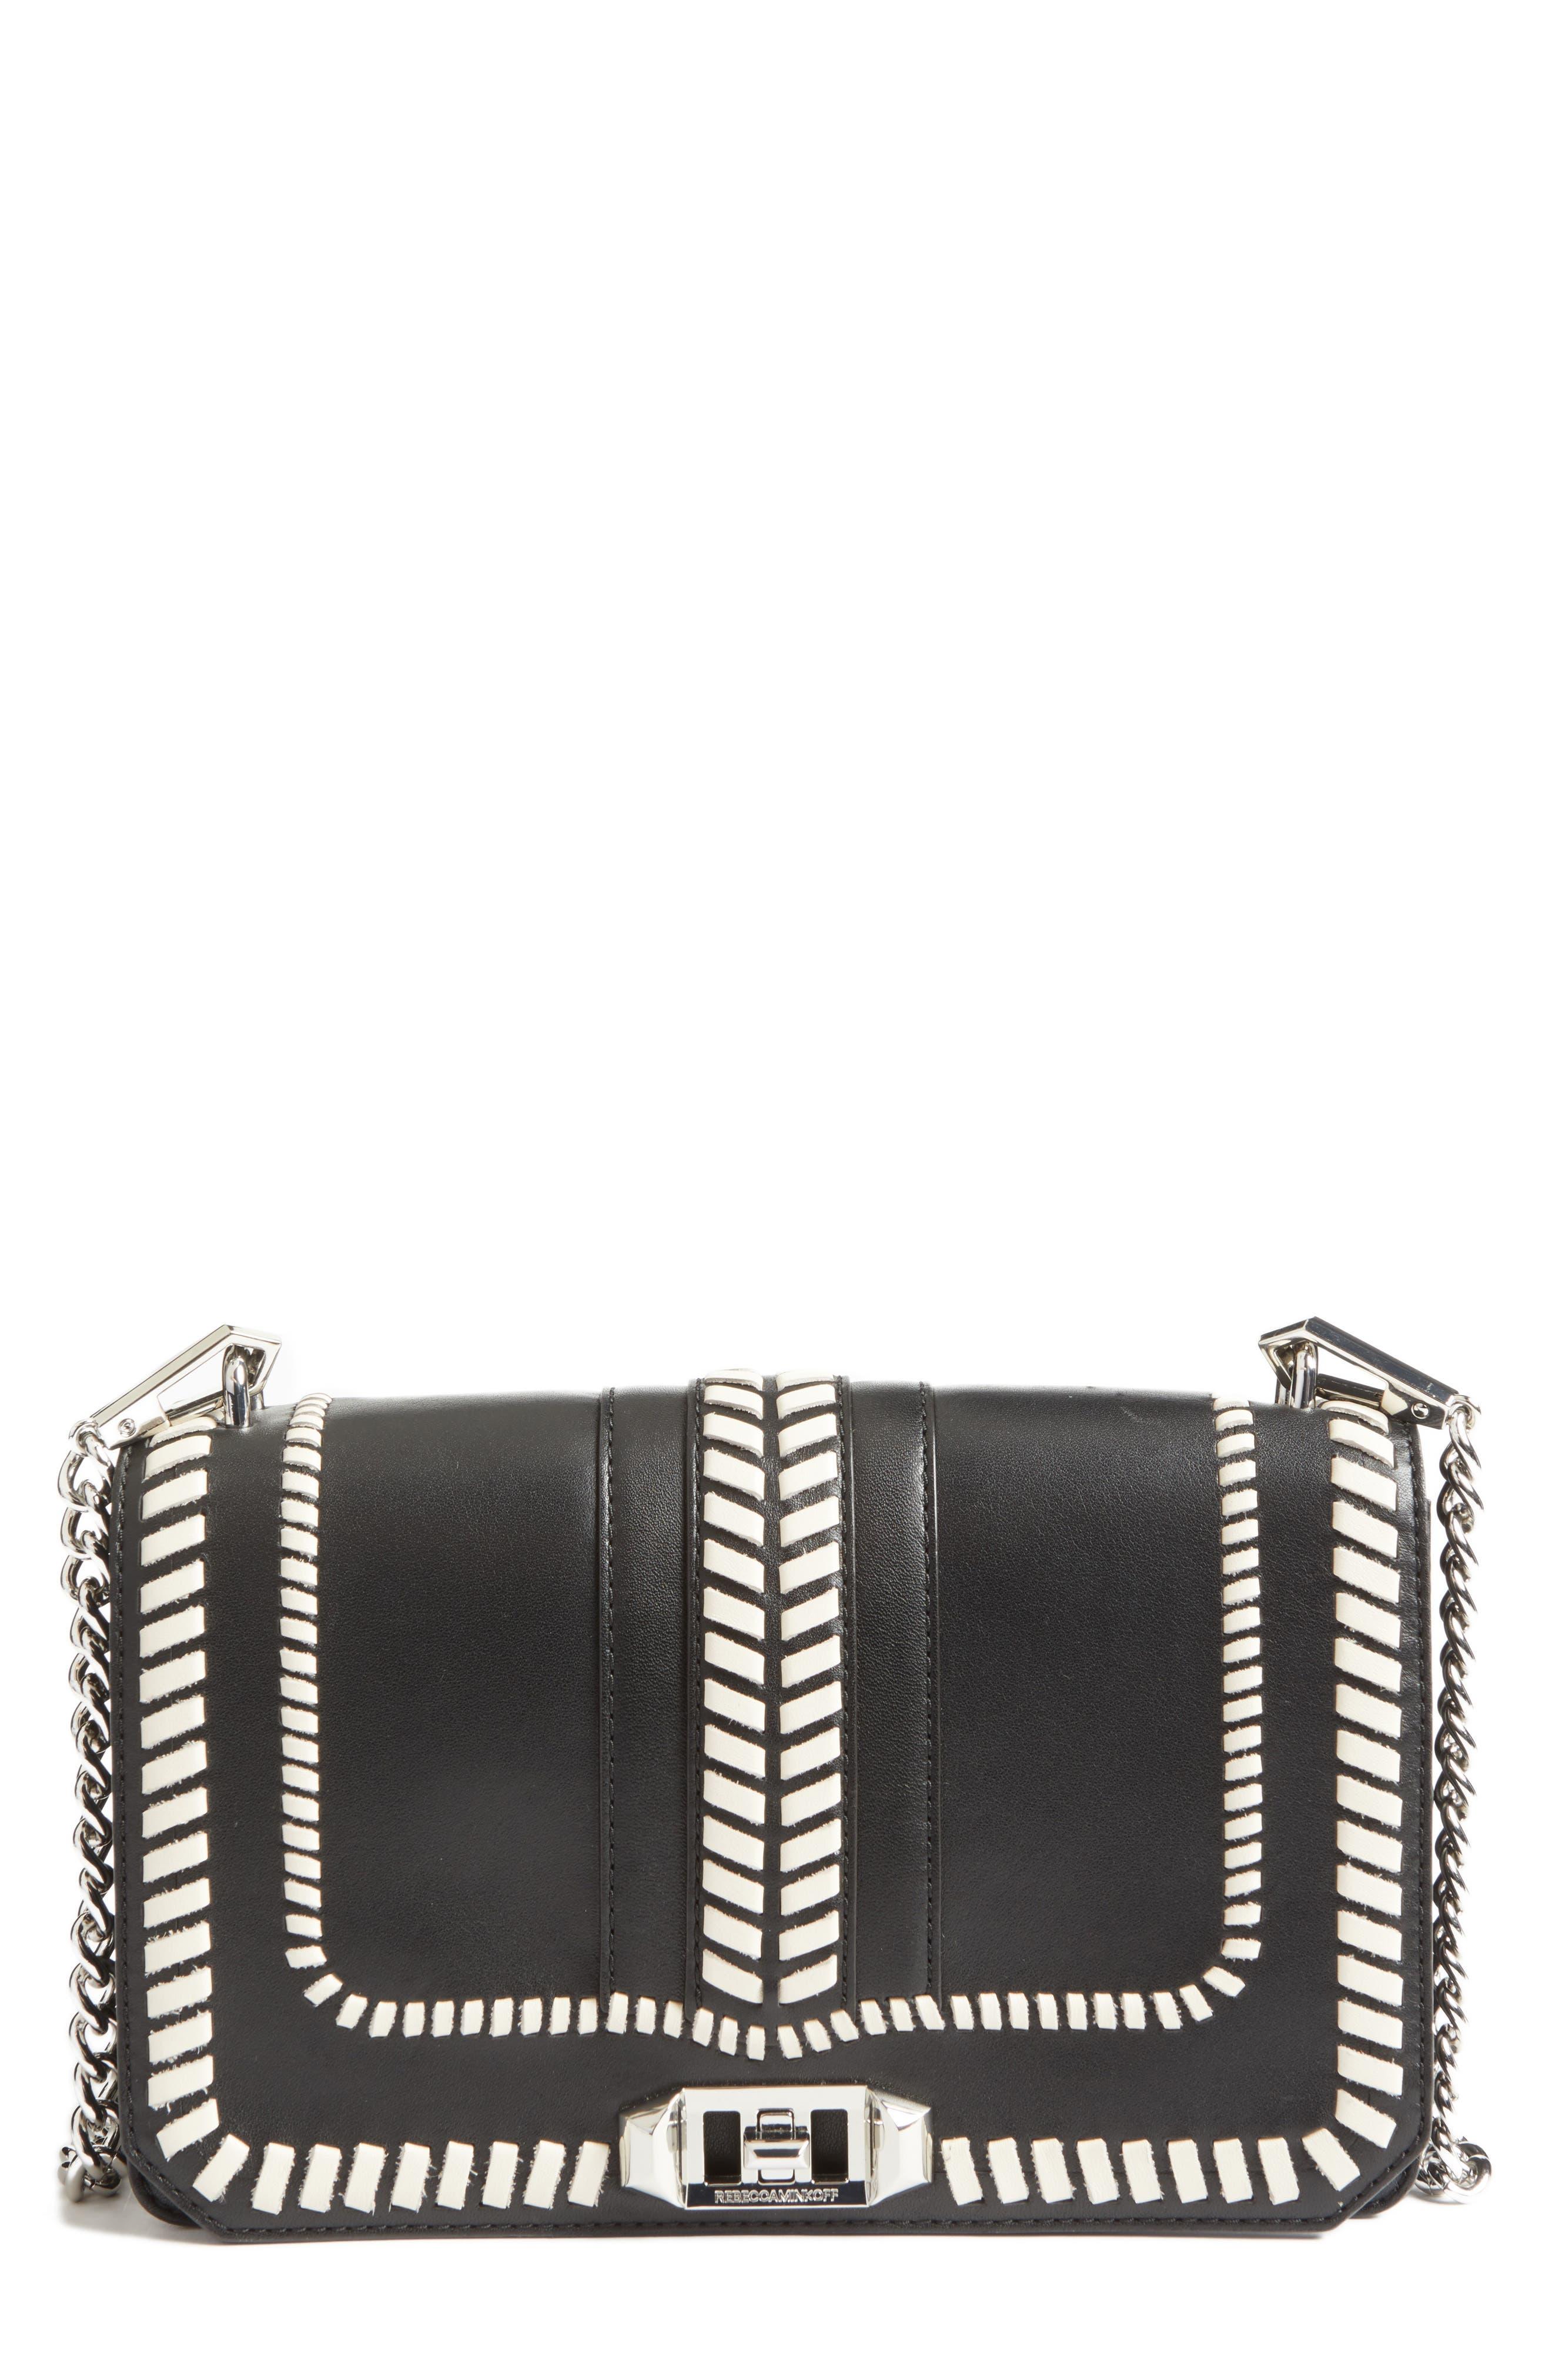 Rebecca Minkoff Love Leather Convertible Crossbody Bag